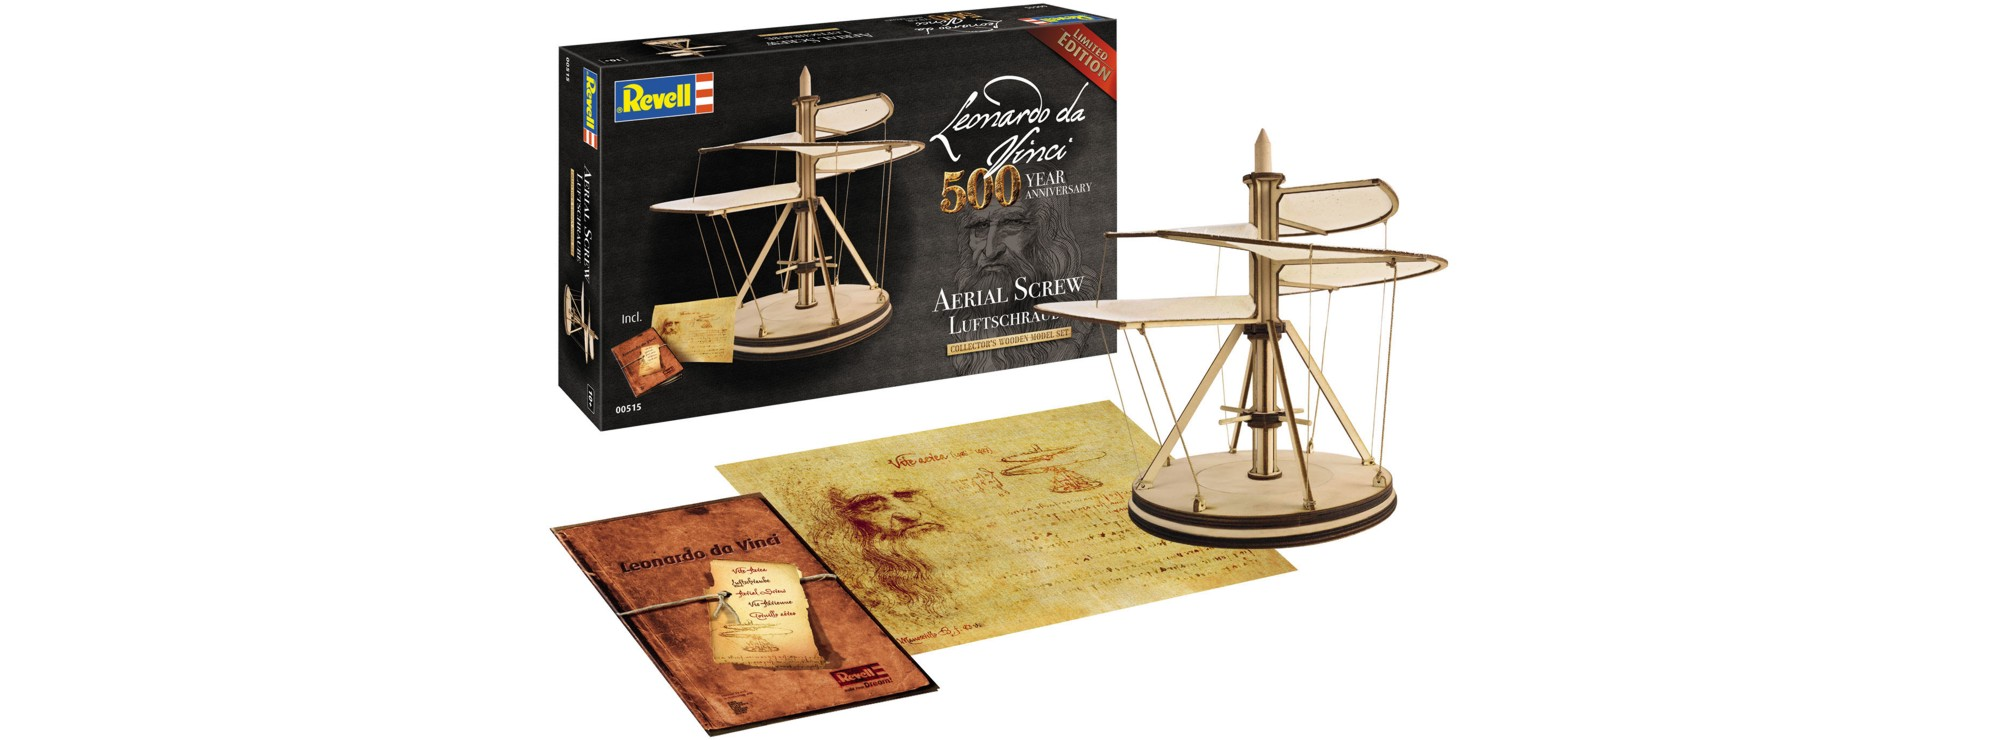 Revell Leonardo da Vinci Luftschraube Holzbausatz 1:48 00515   .